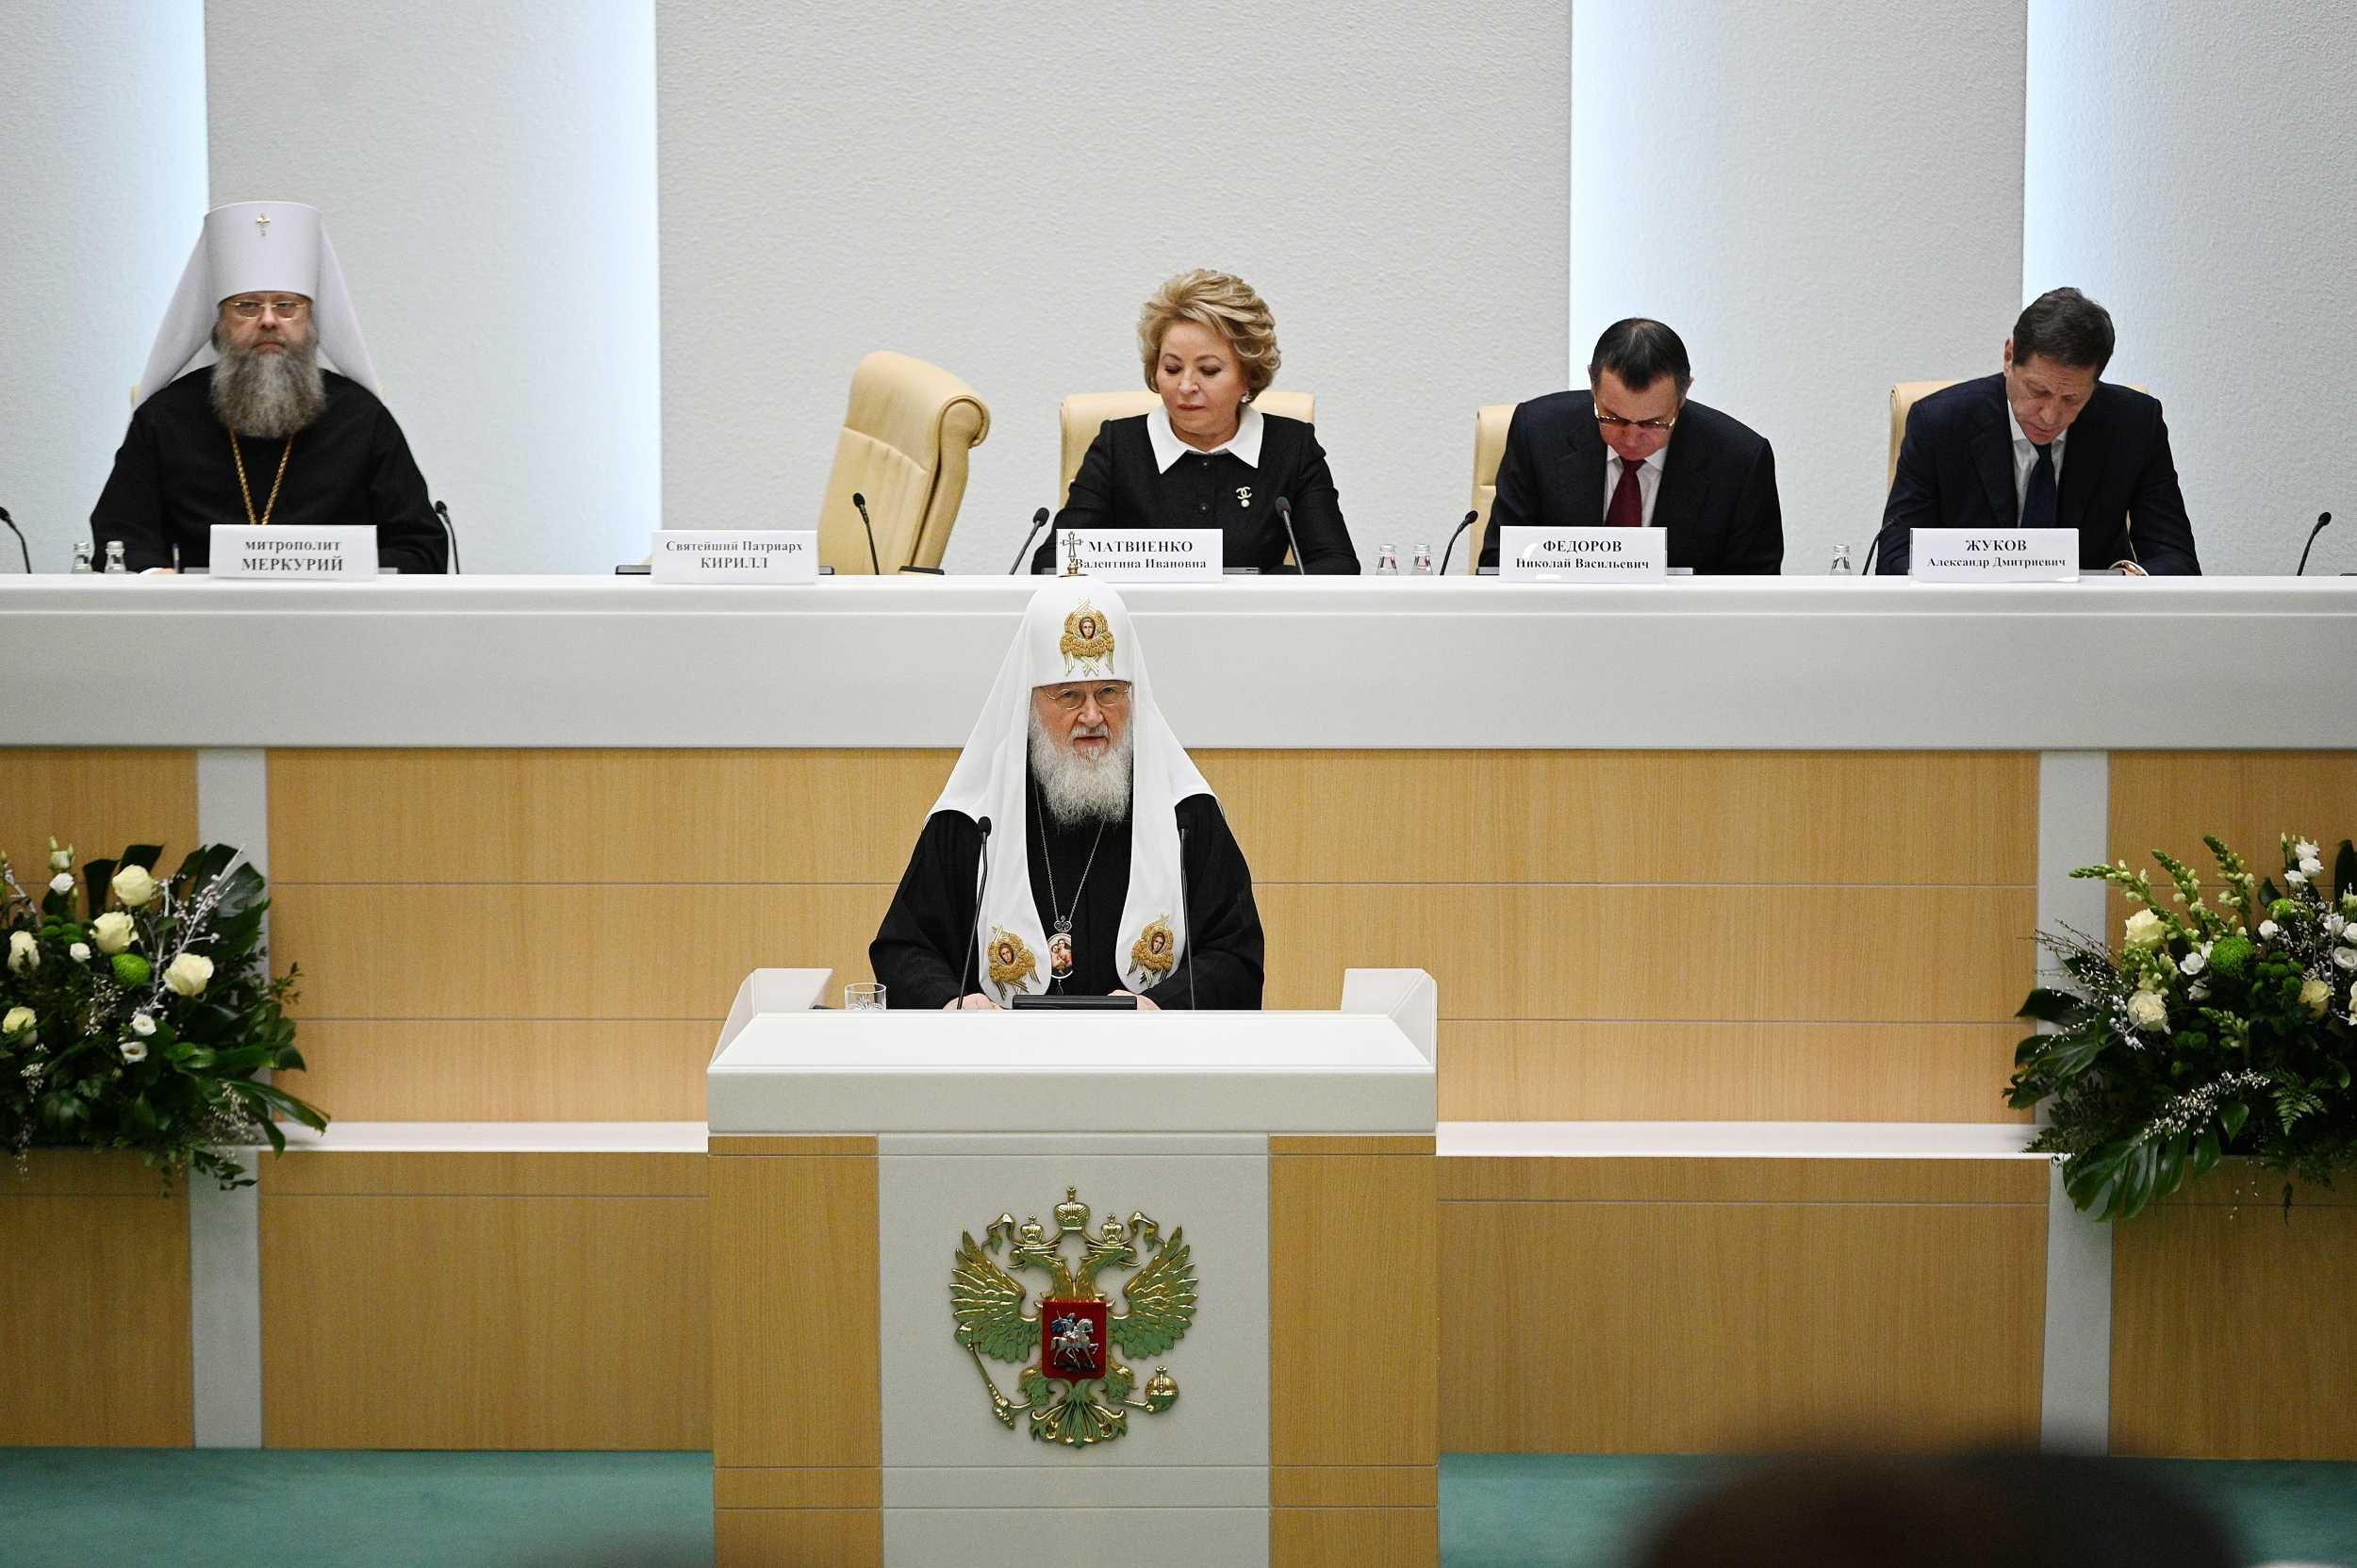 Святейший Патриарх Кирилл в Совете Федерации